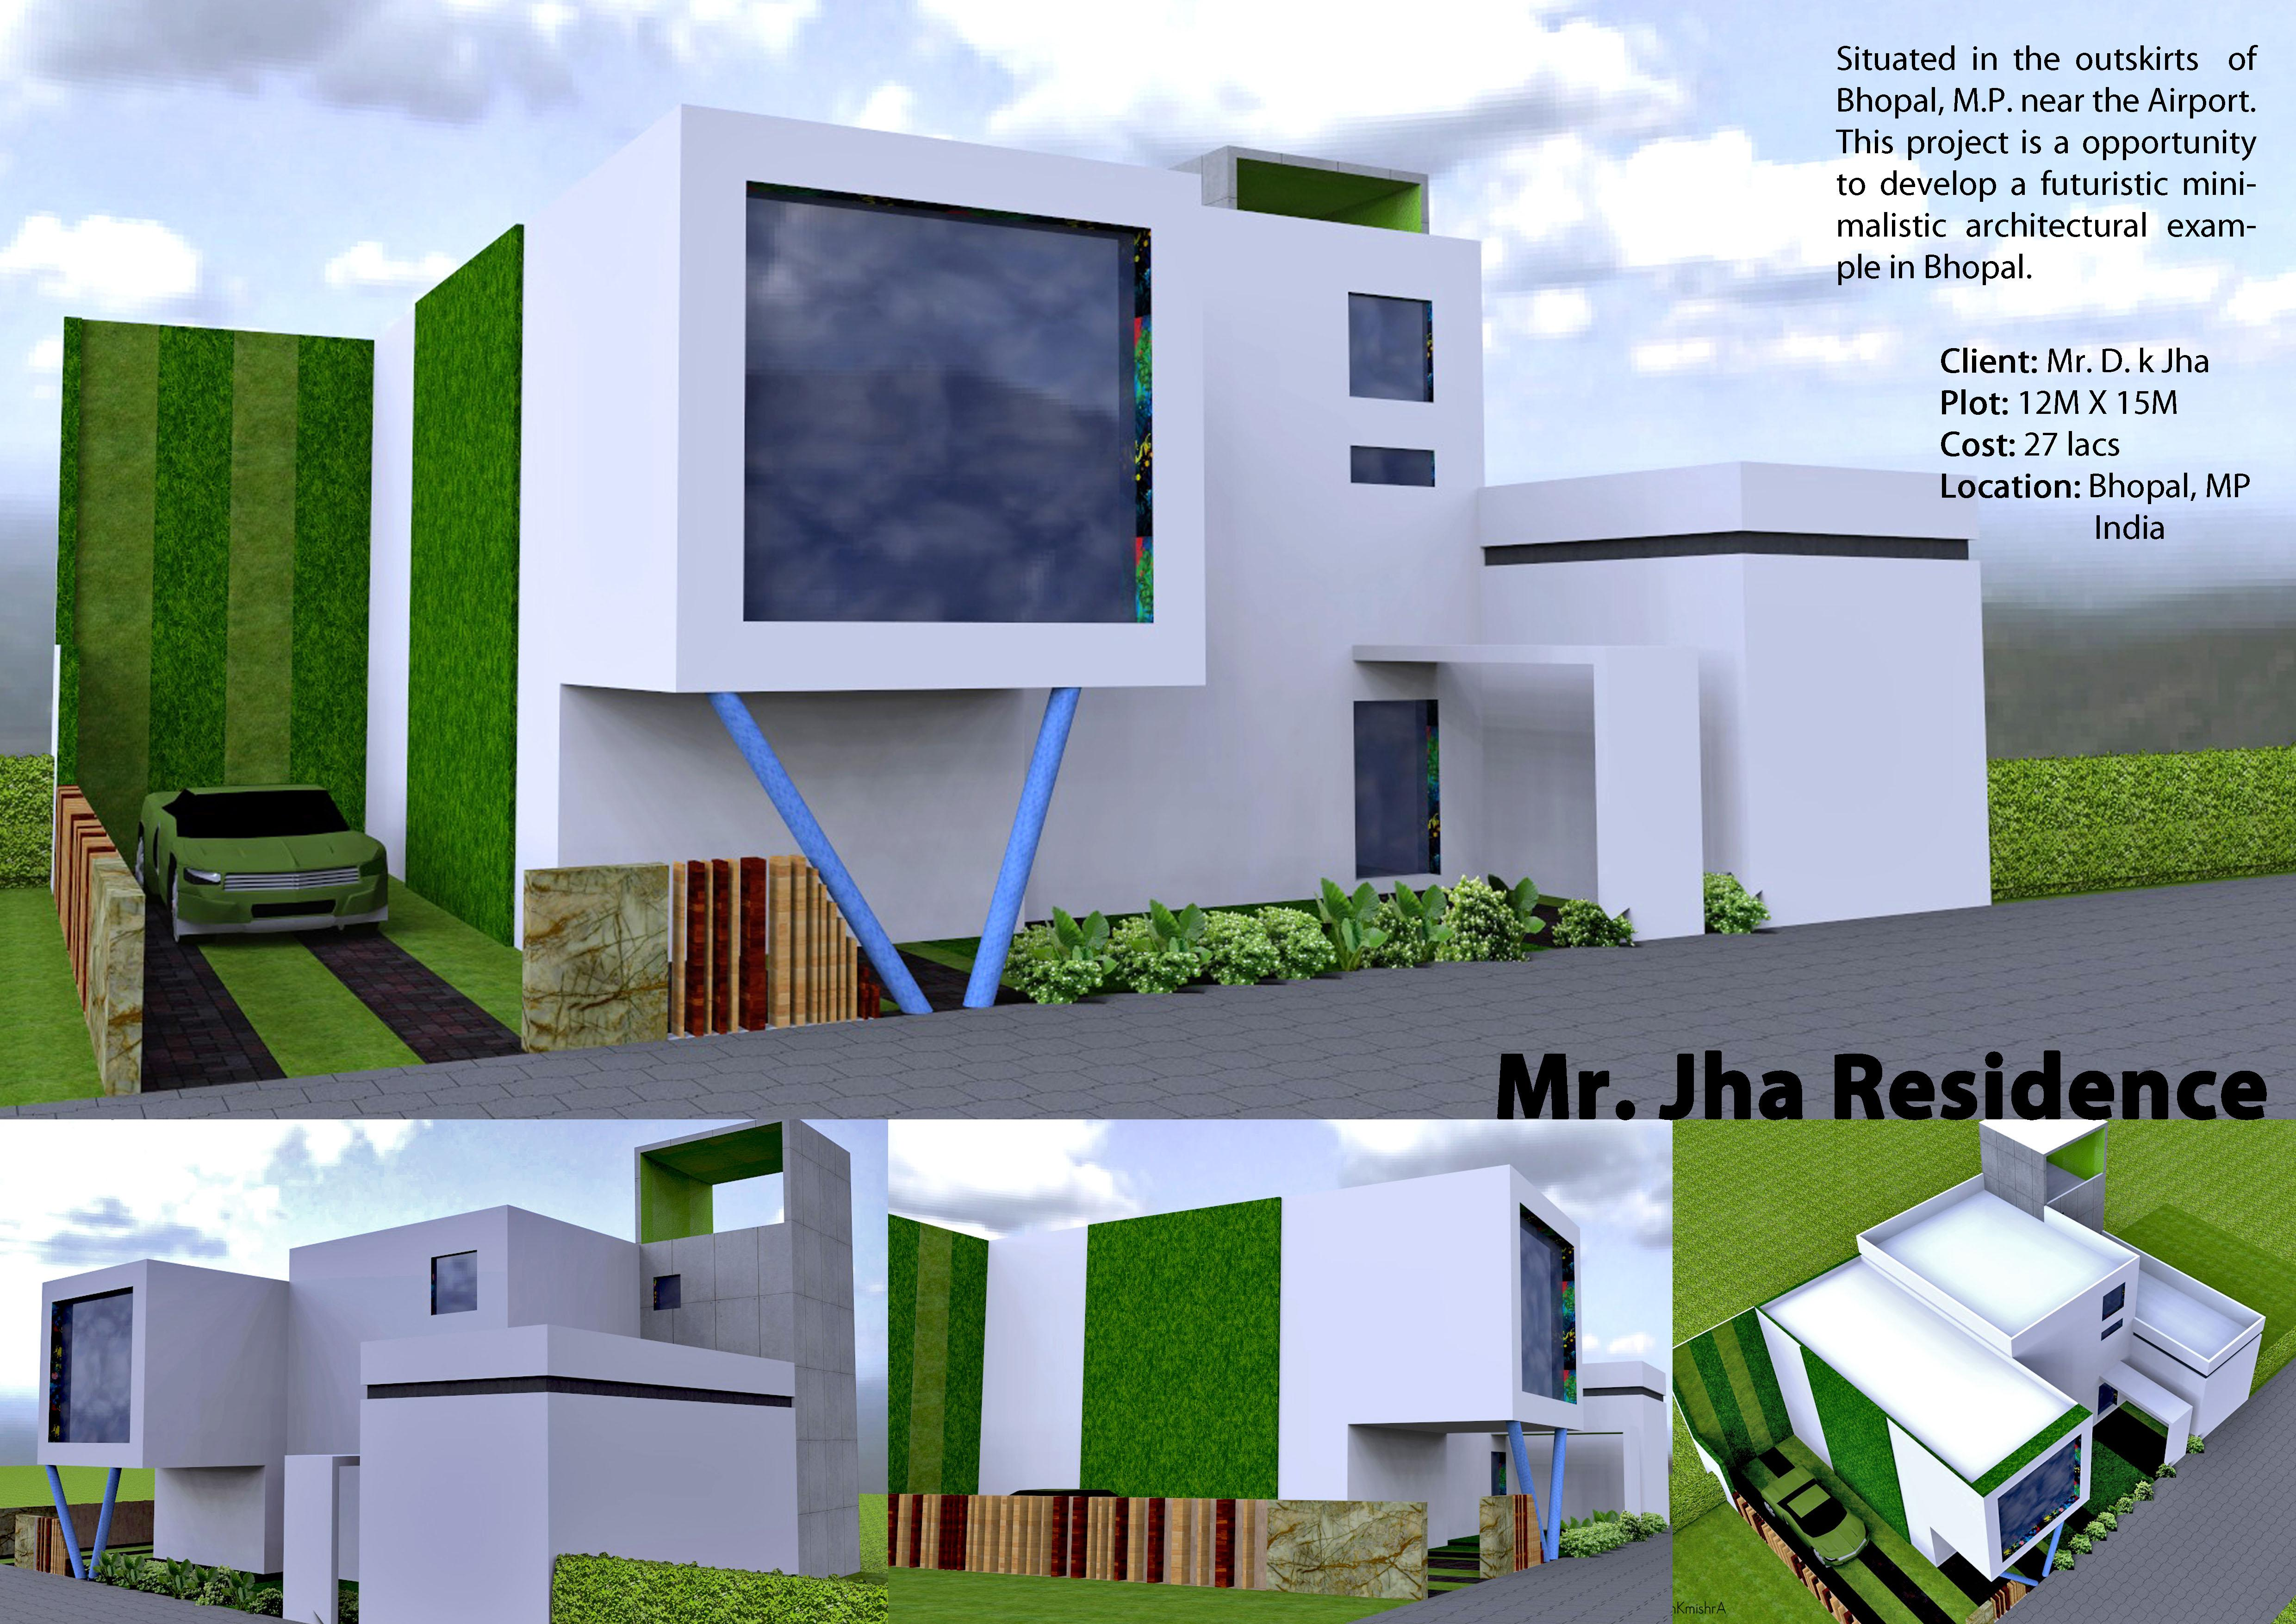 Mr. Jha Residence